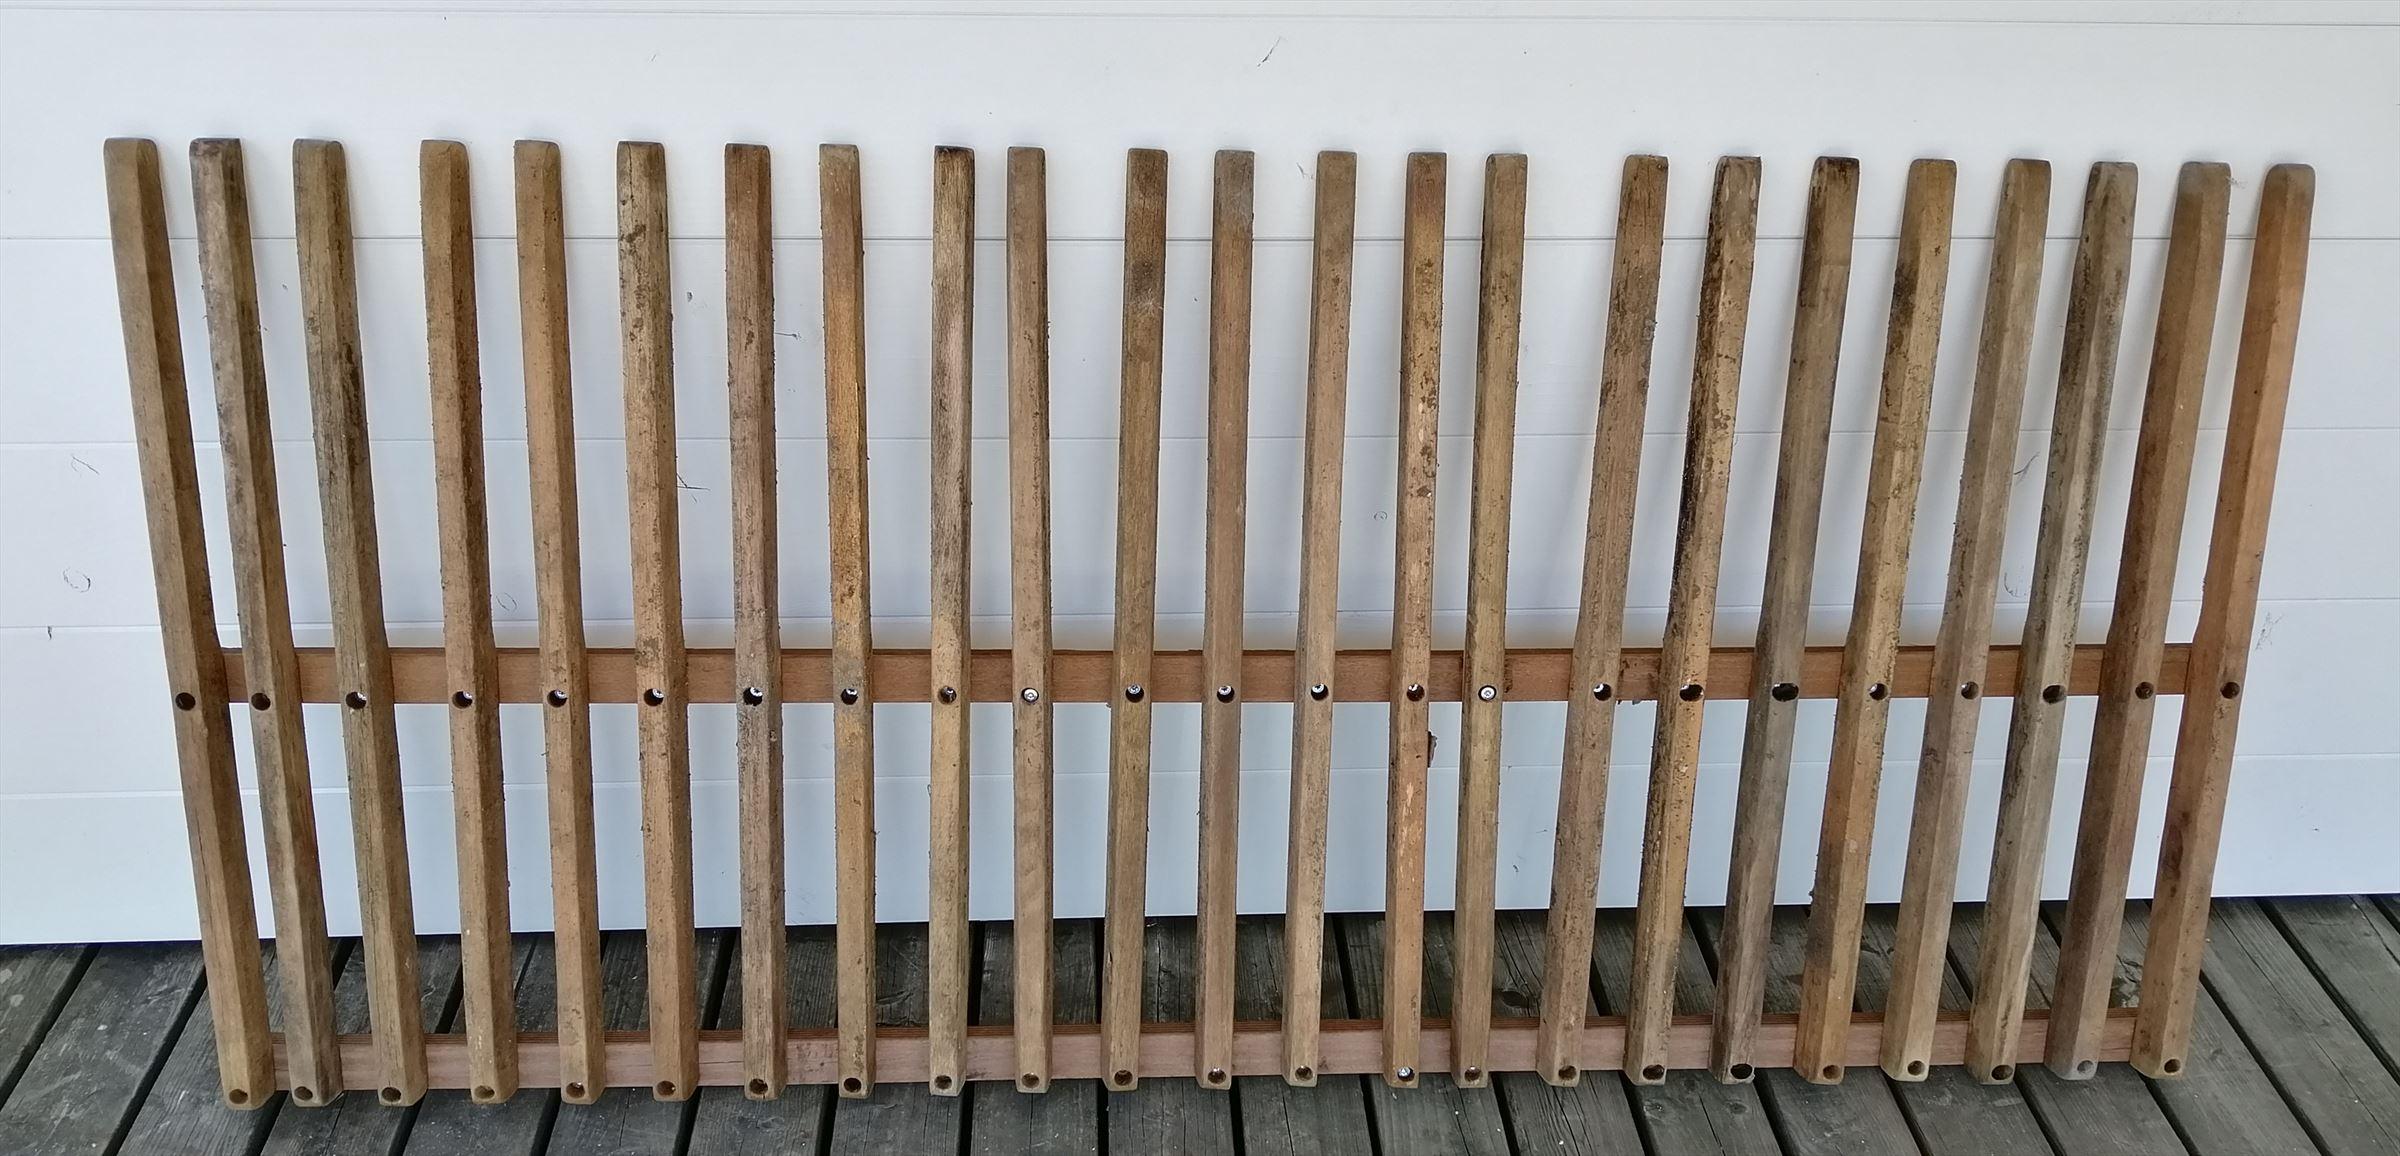 Kühlkamp hardhouten spijlenhek, afm. 180 x 80 cm, b-keus